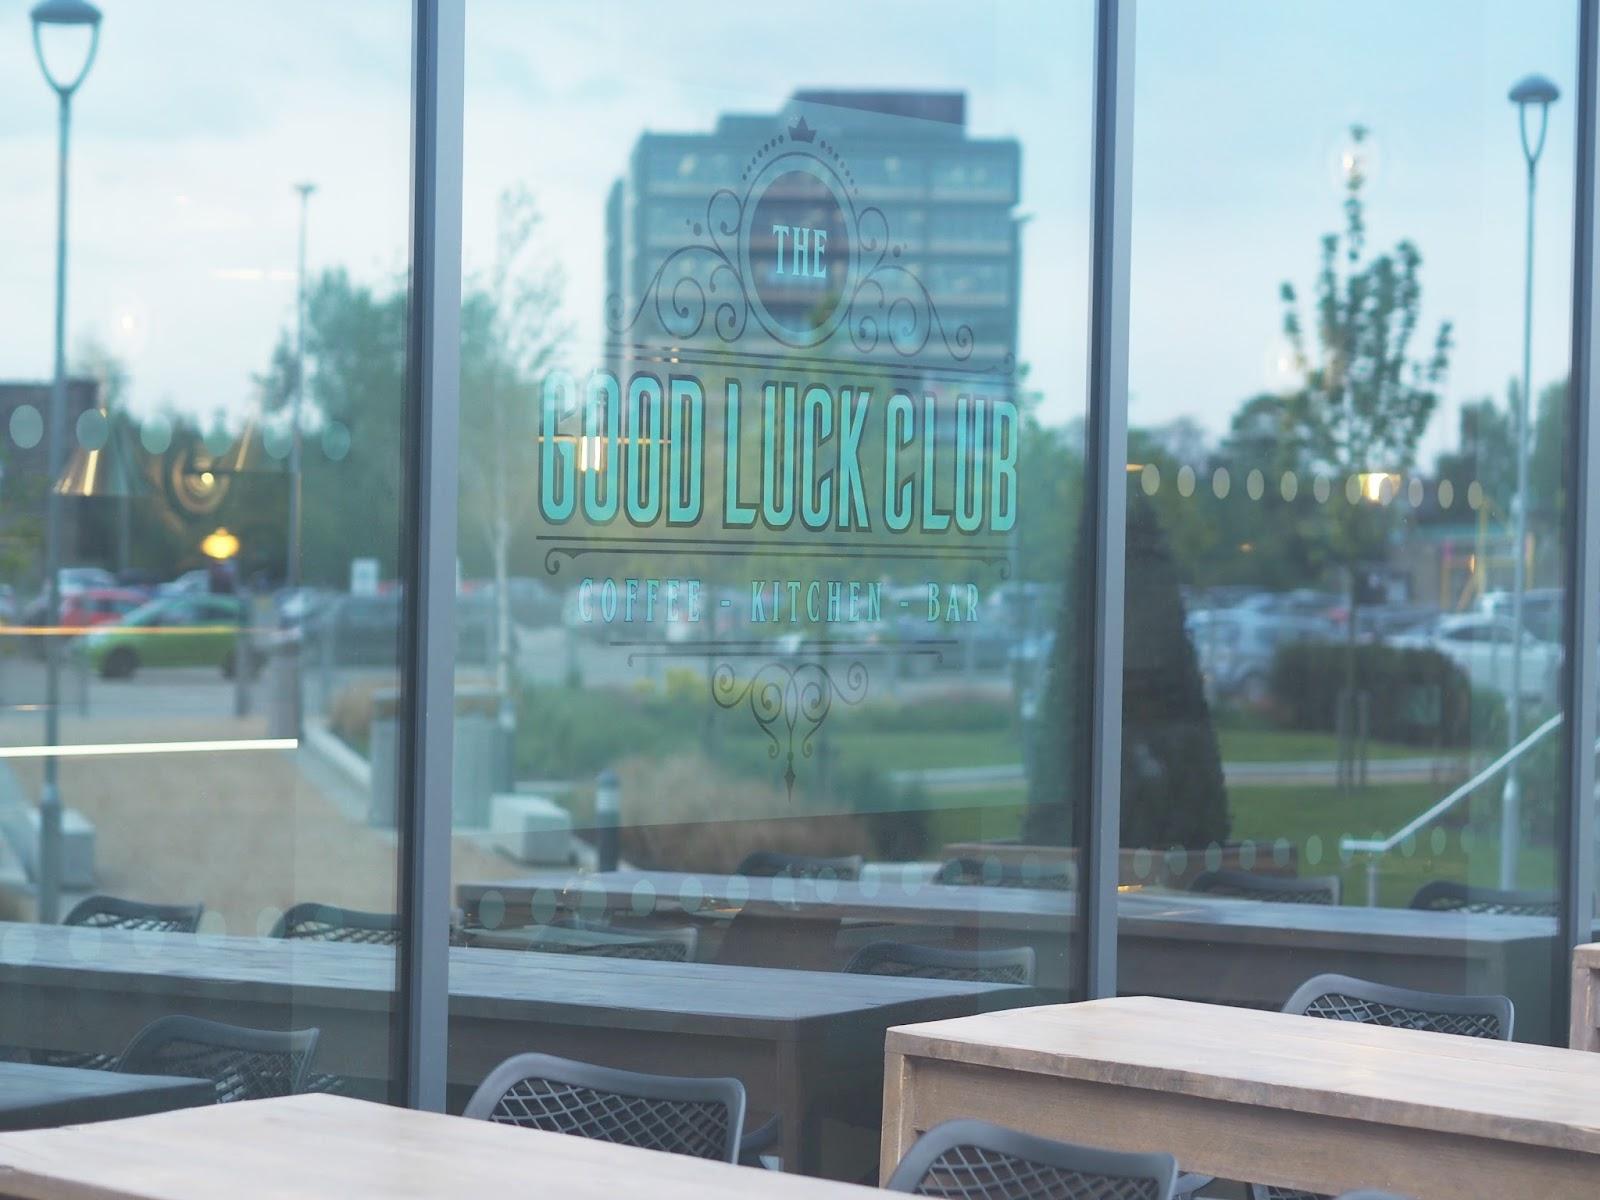 The Good Luck Club Leeds